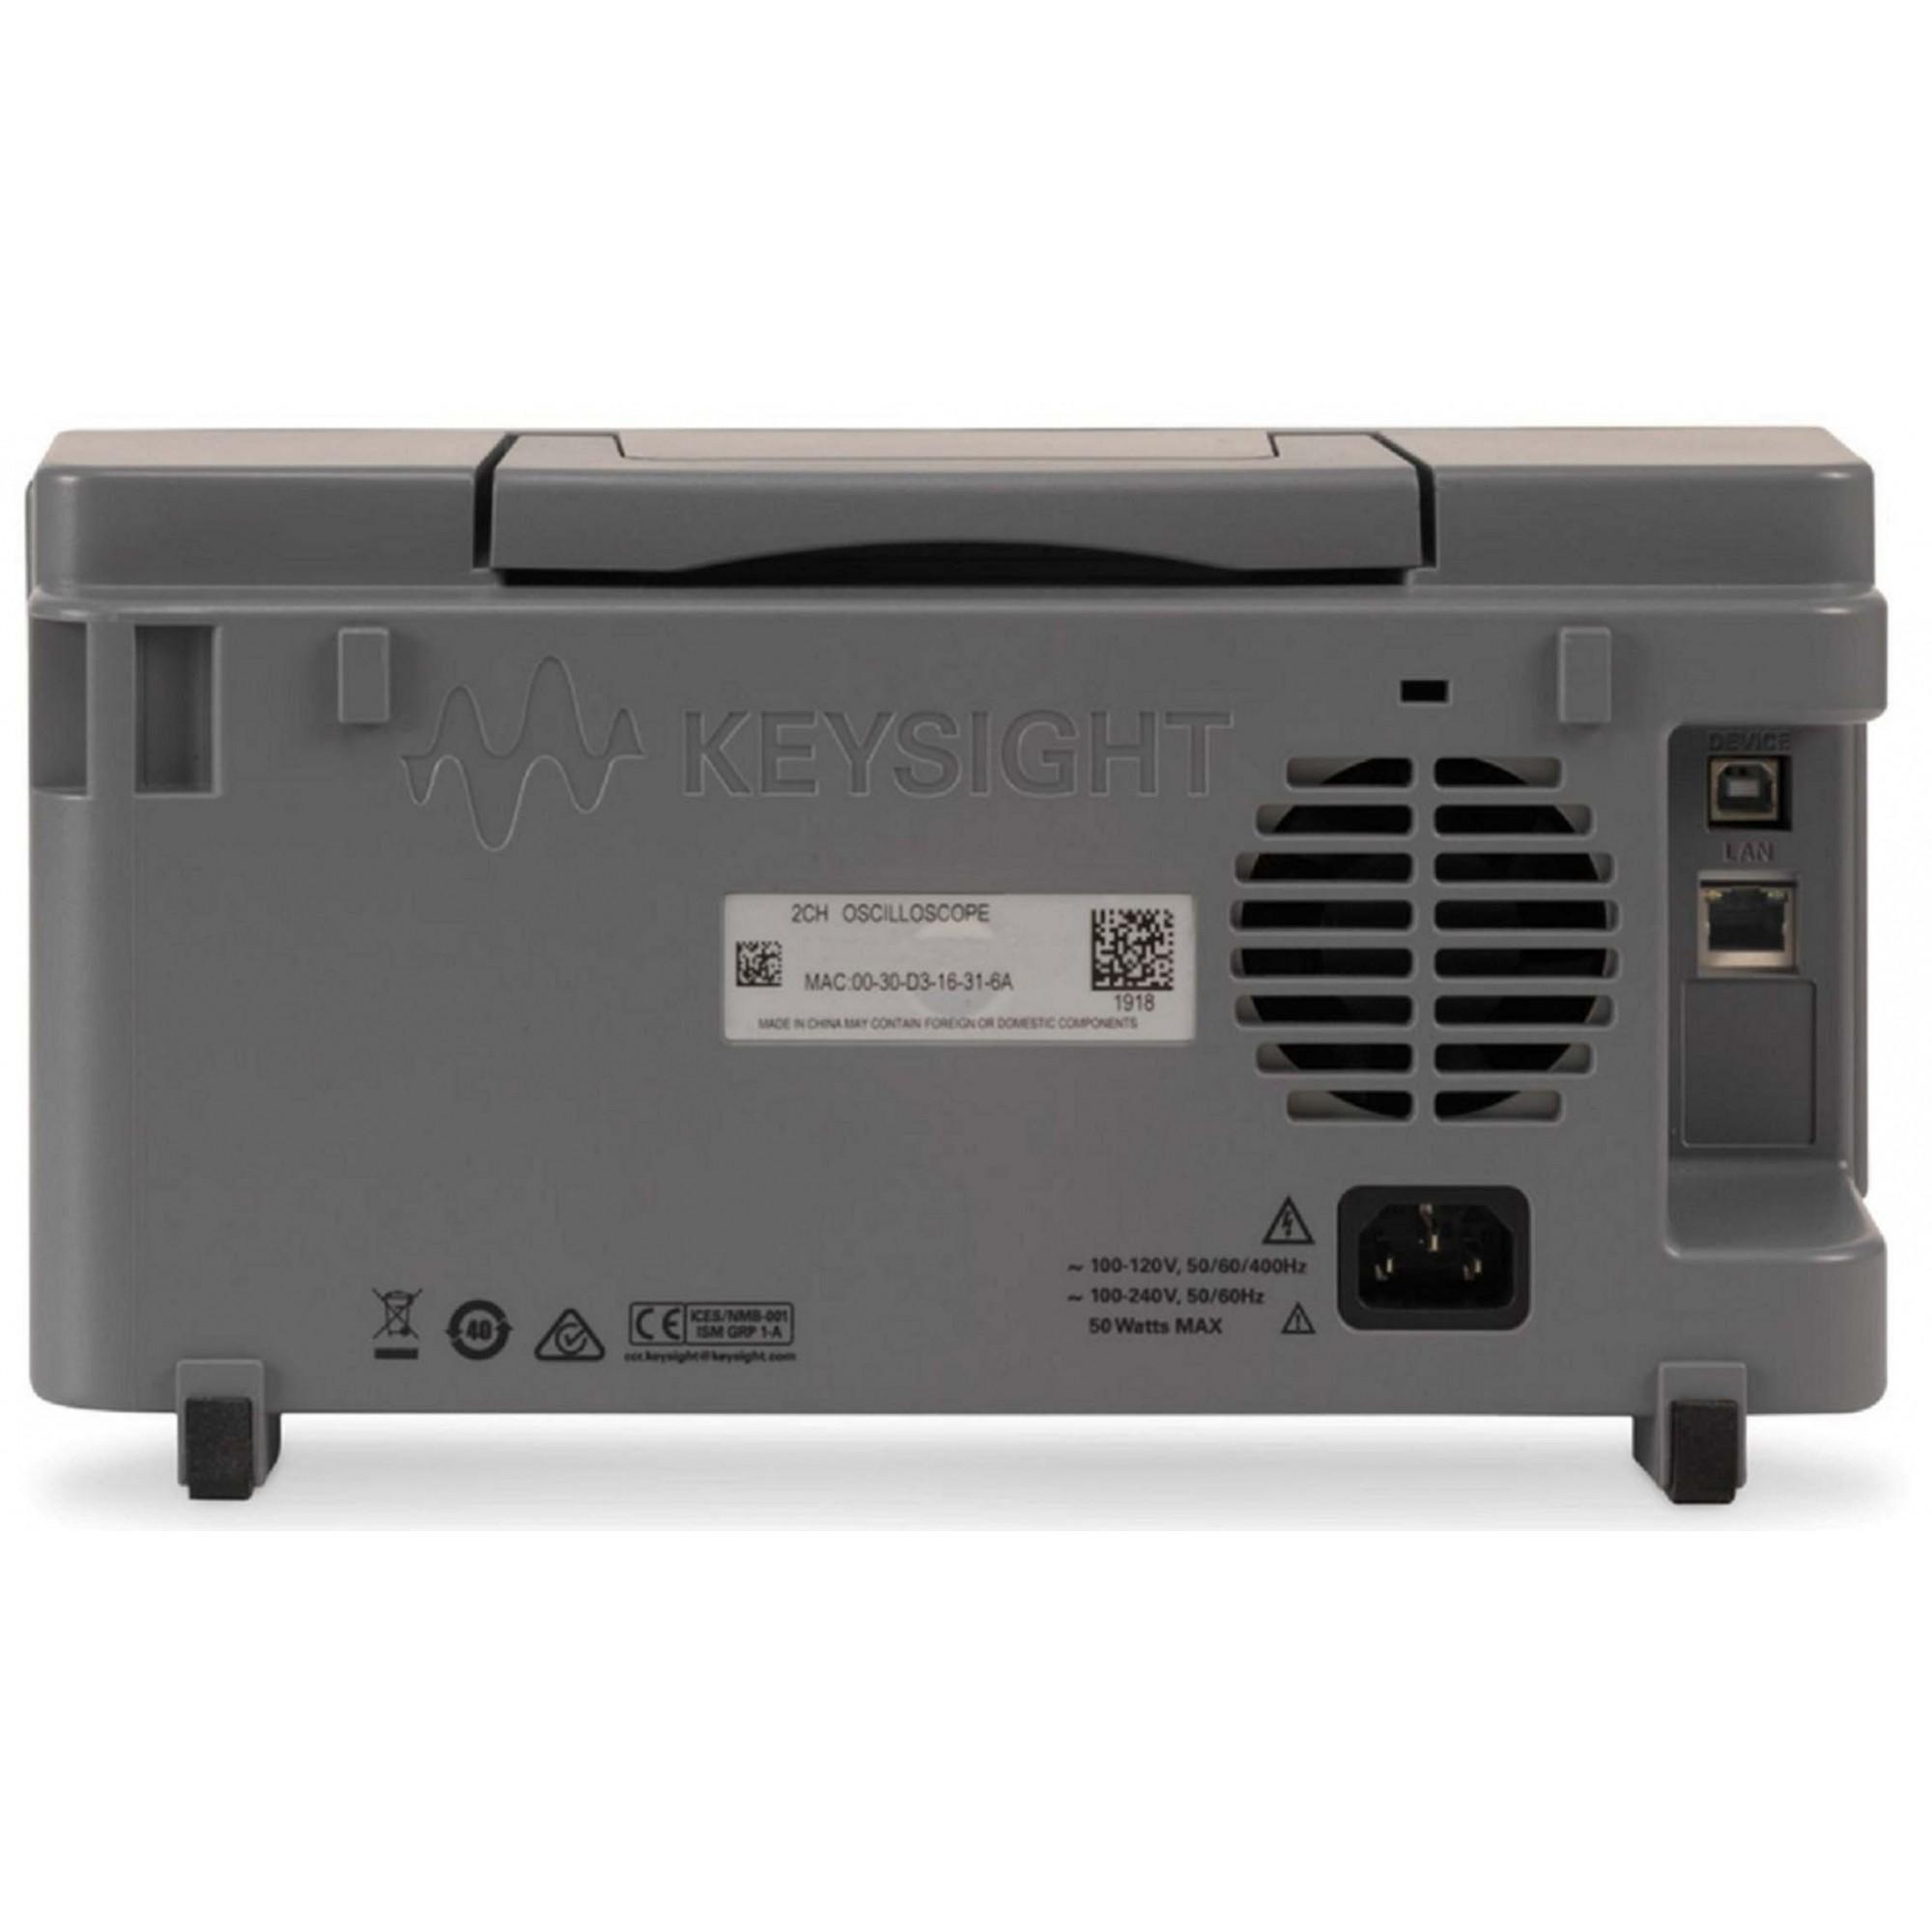 EDUX1052A - Osciloscópio Digital 50 MHz, 2 Canais